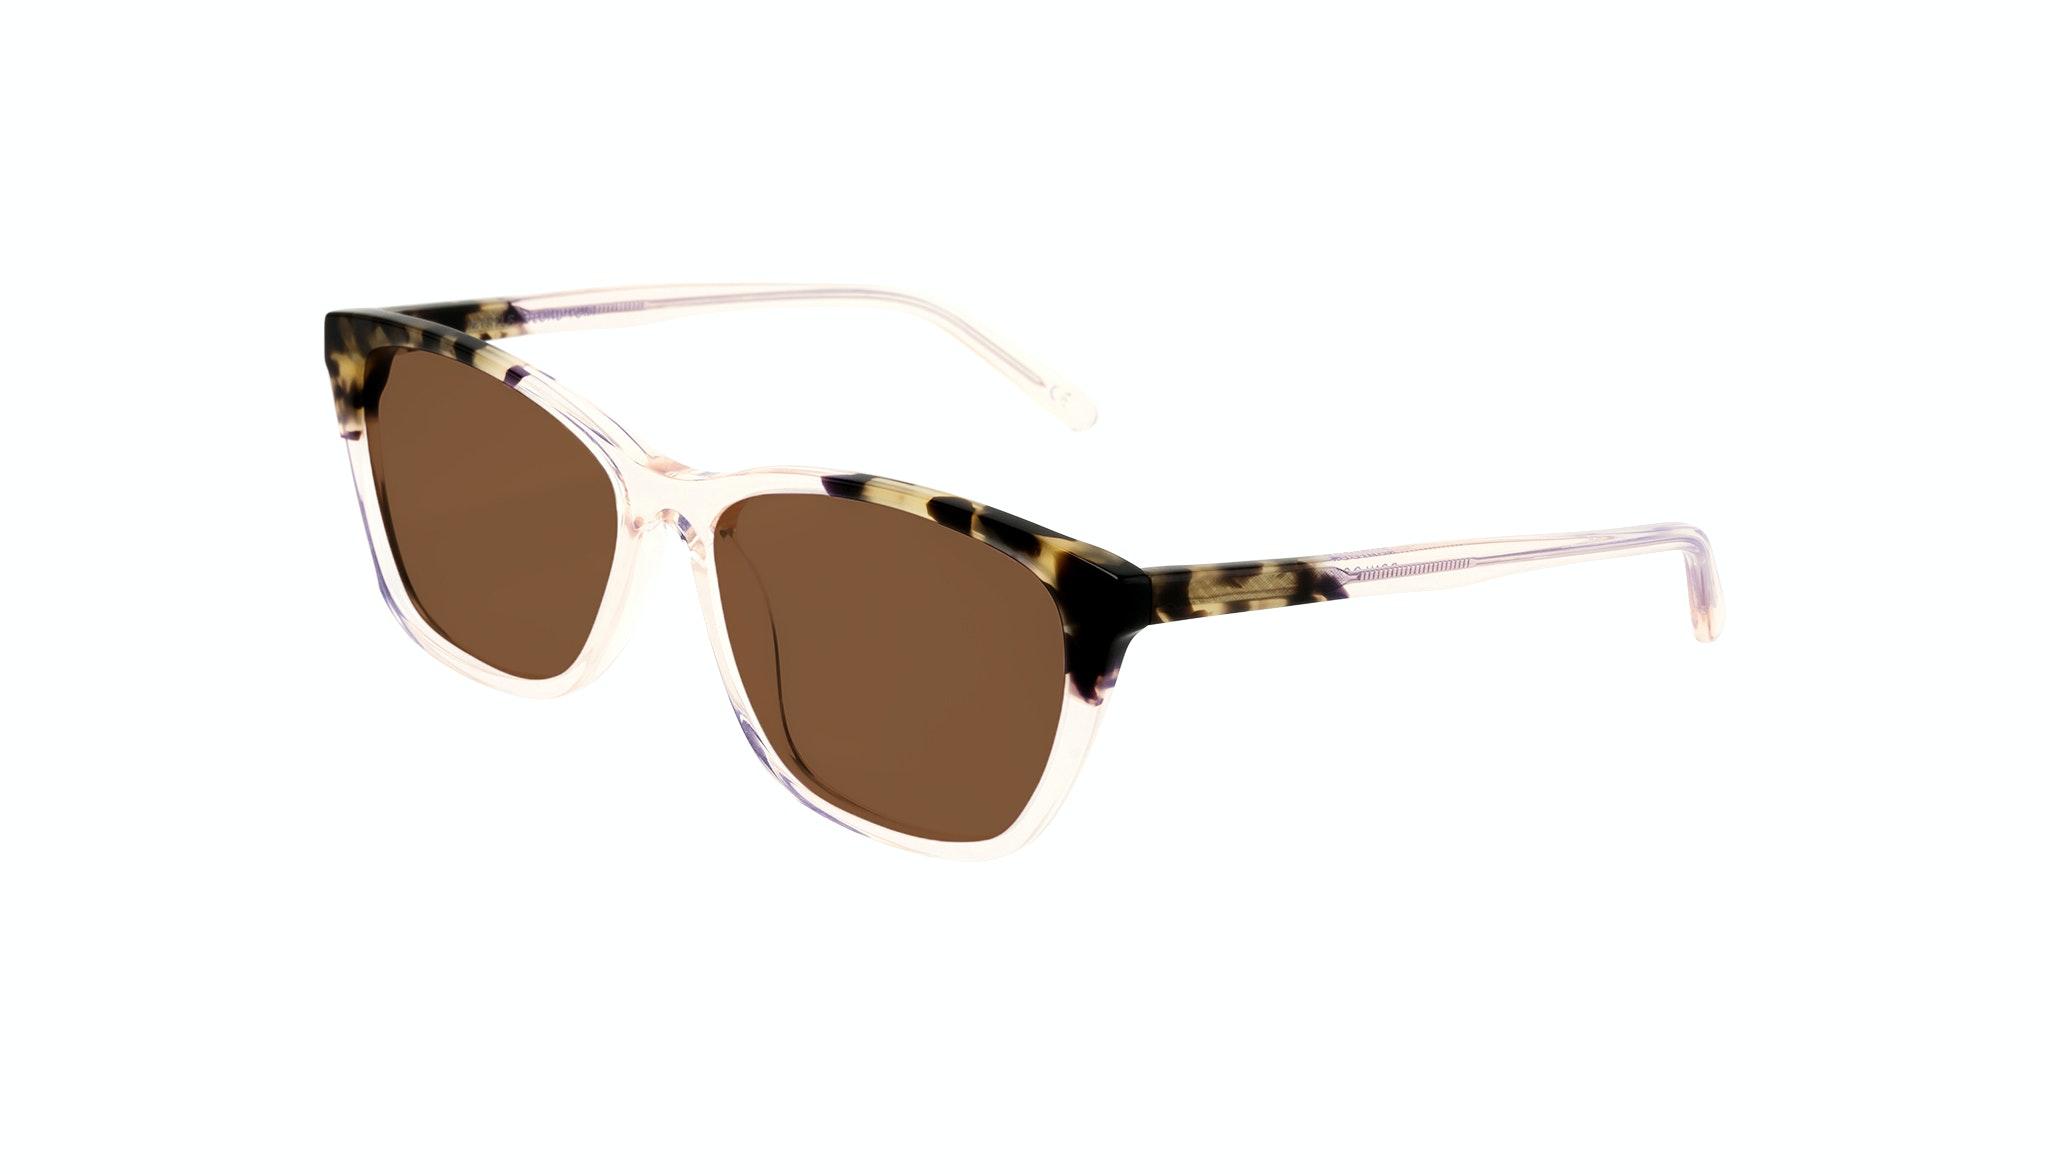 Affordable Fashion Glasses Cat Eye Rectangle Sunglasses Women Myrtle Blond Tortoise Tilt